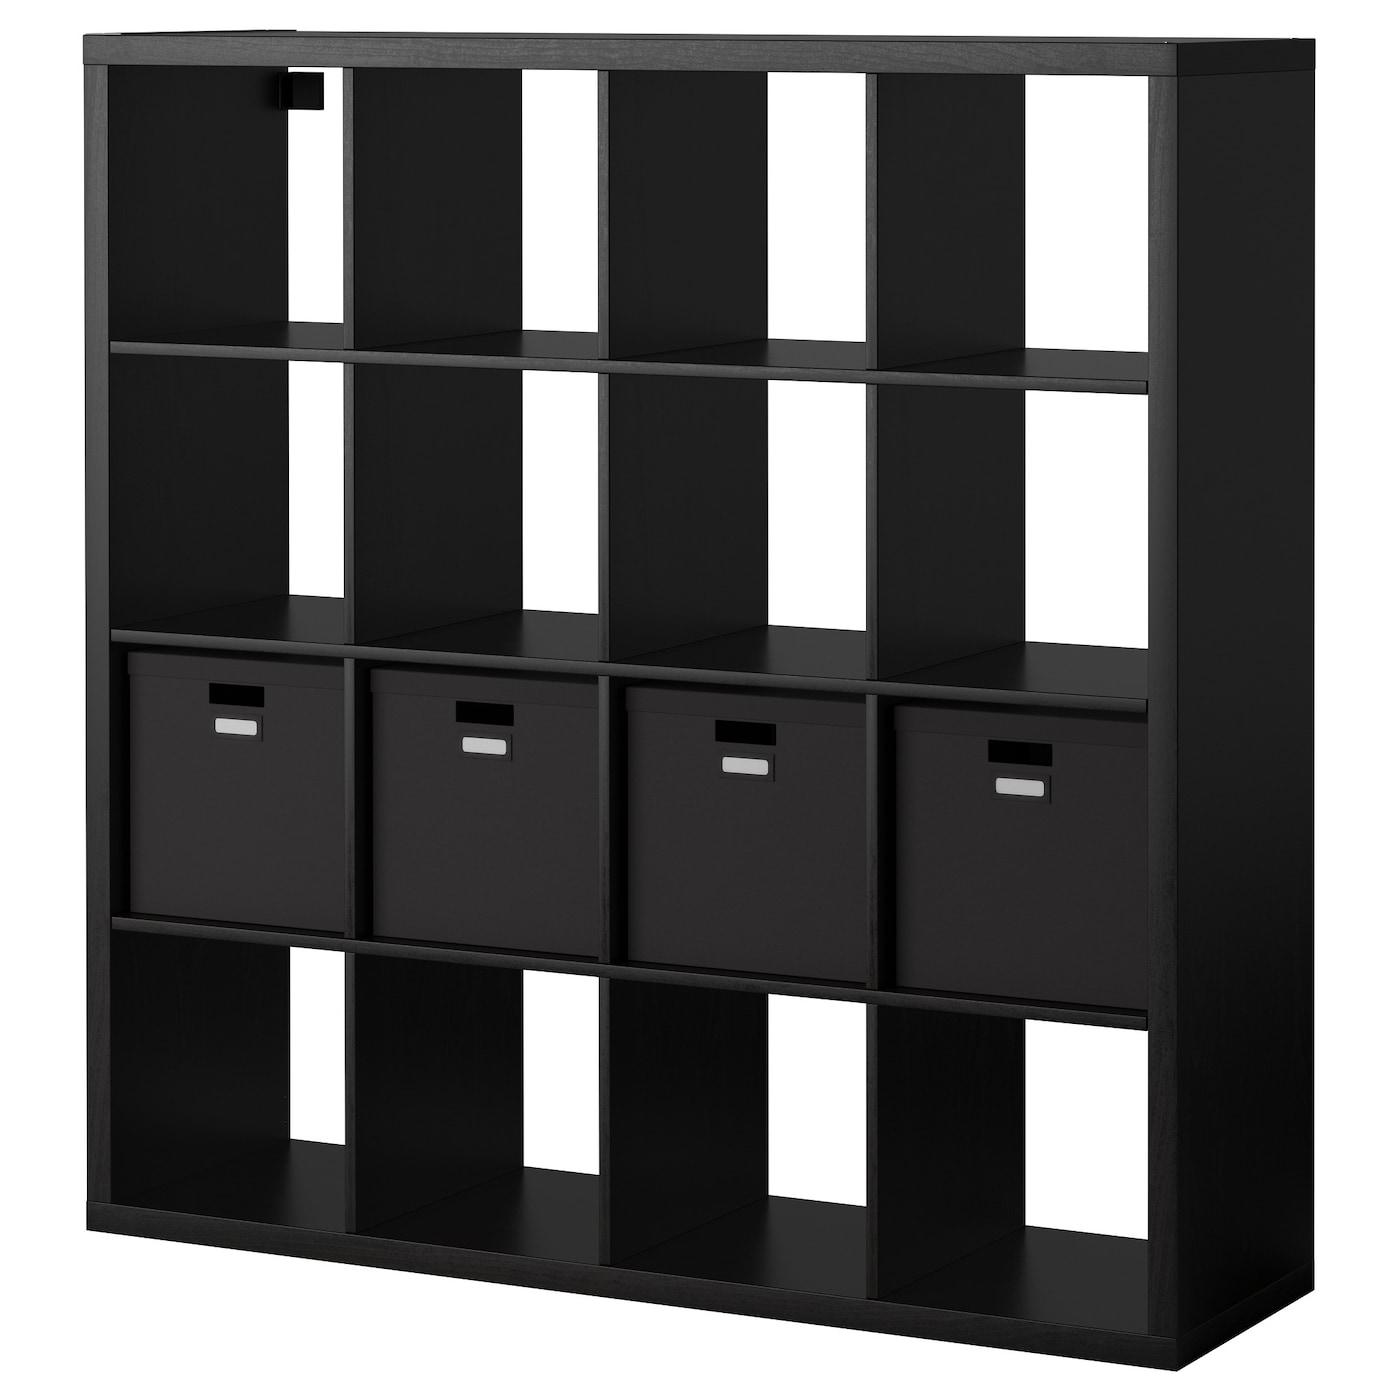 IKEA KALLAX shelving unit with 4 inserts. KALLAX   IKEA